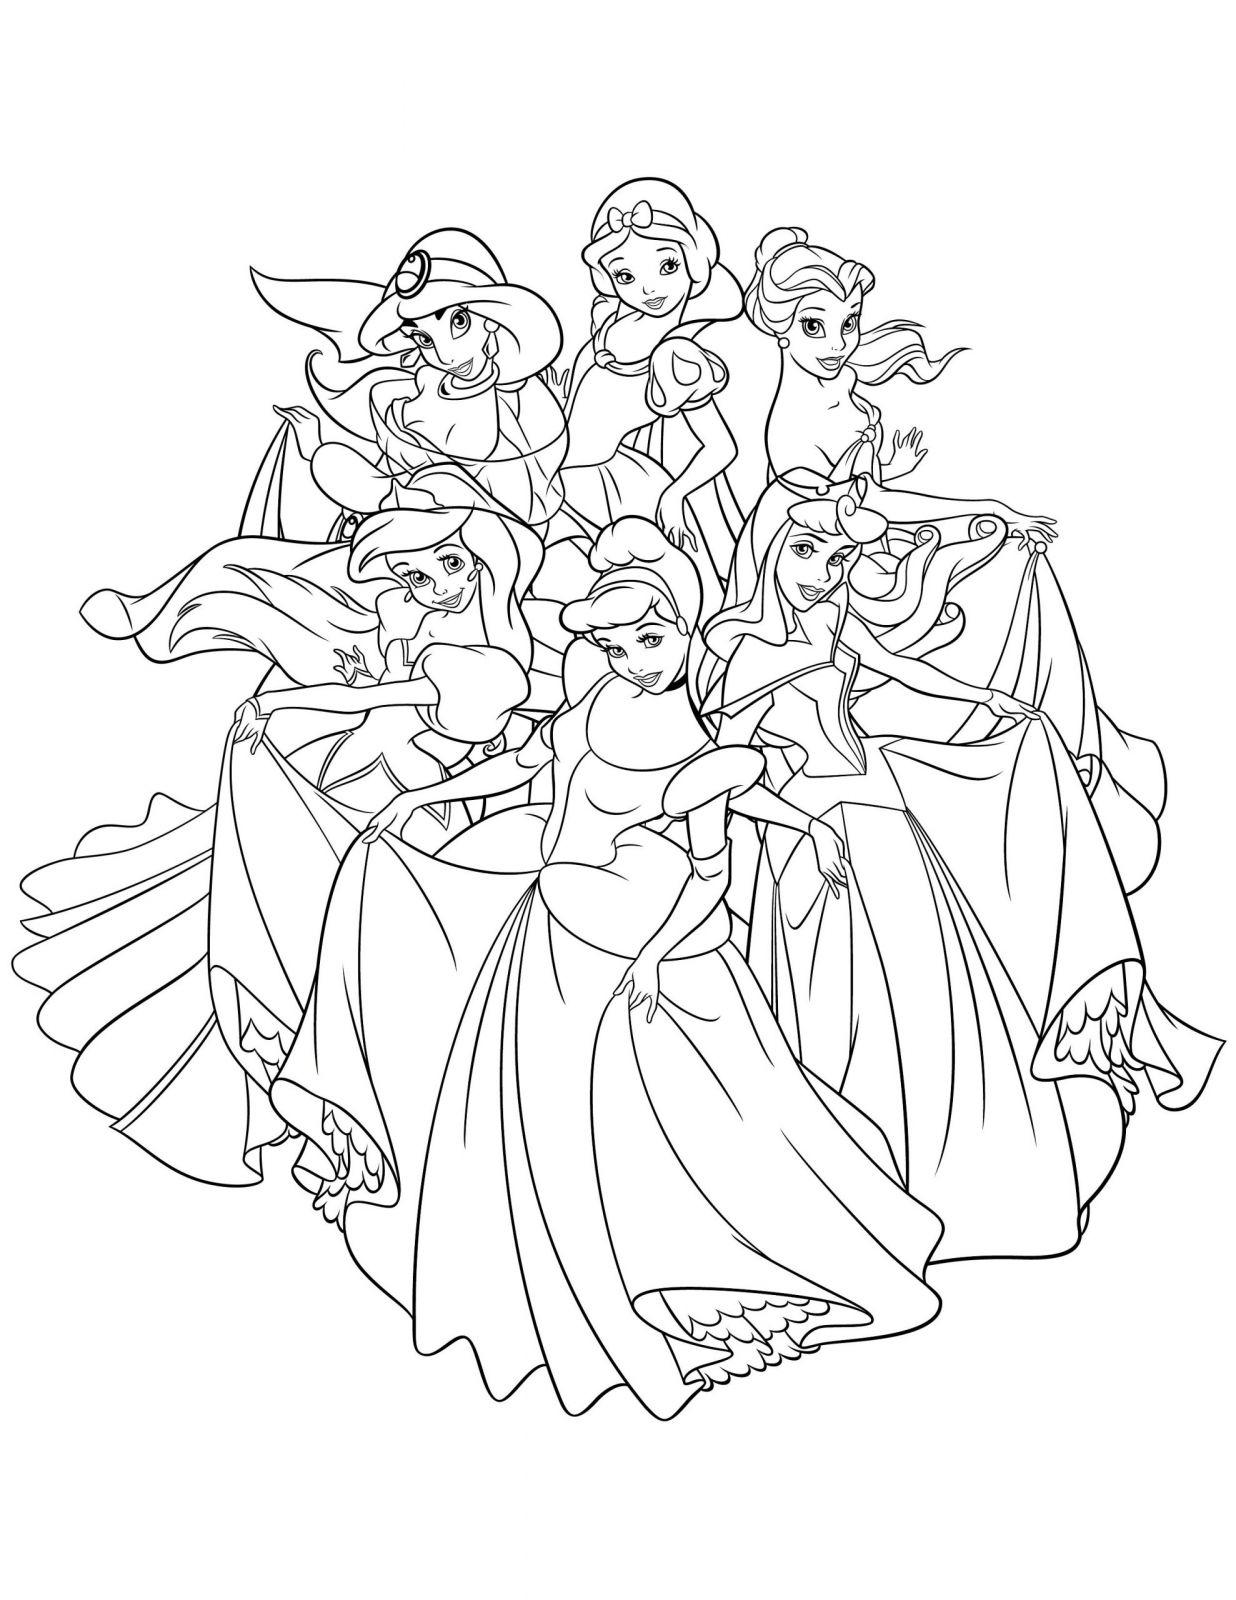 Coloriage Disney À Imprimer Princesse   Coloriages À destiné Coloriage Princesses Disney À Imprimer